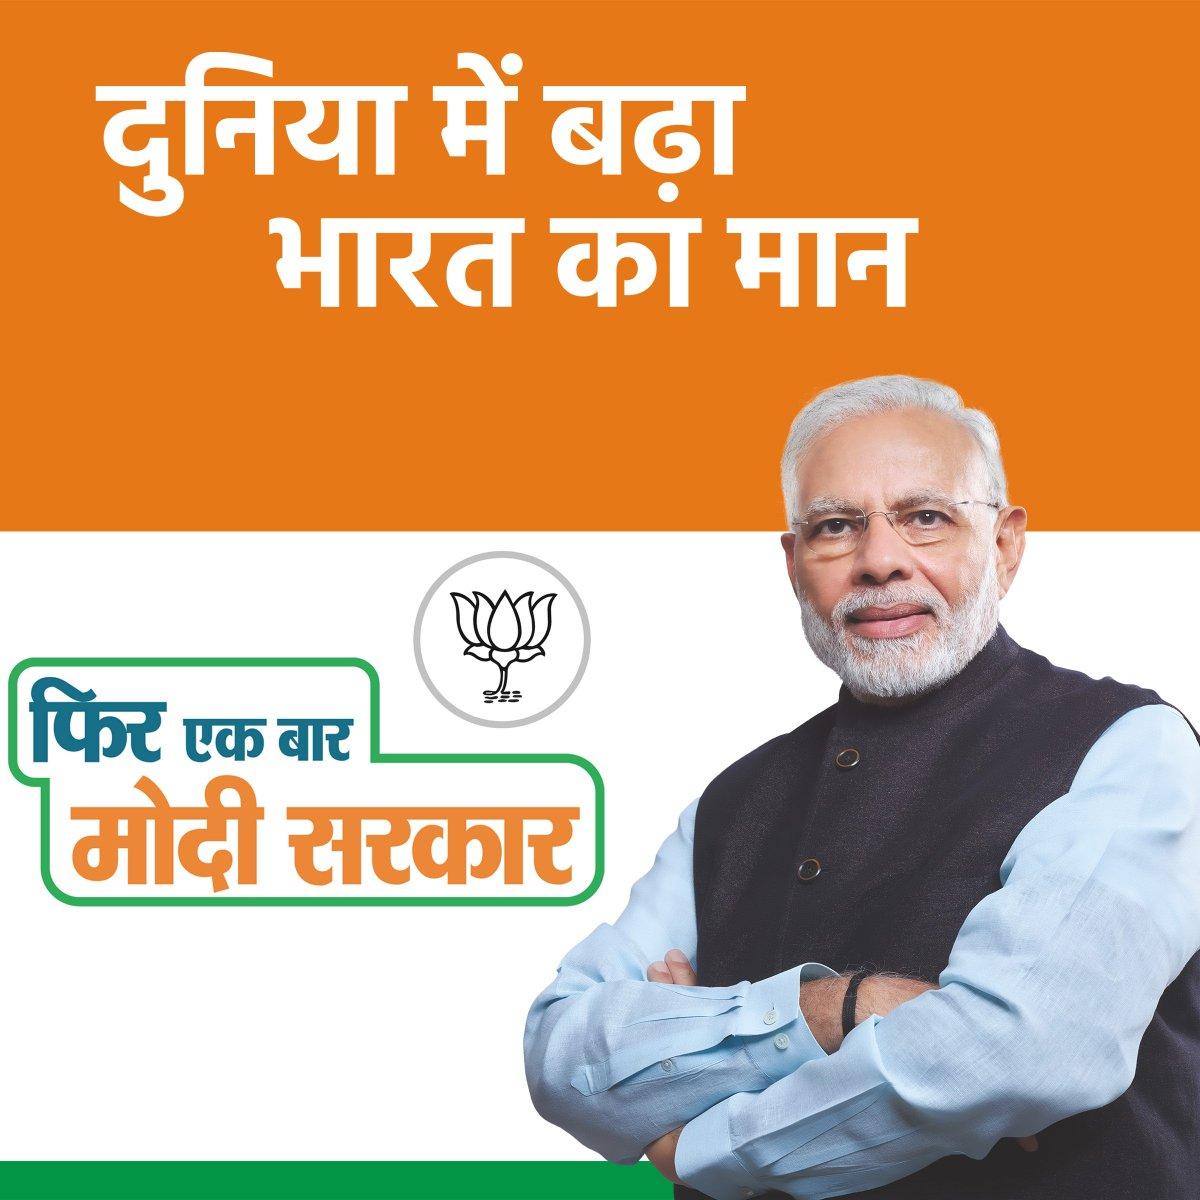 Jahnavi Jain  ЁЯЗоЁЯЗ│'s photo on #VoteKar